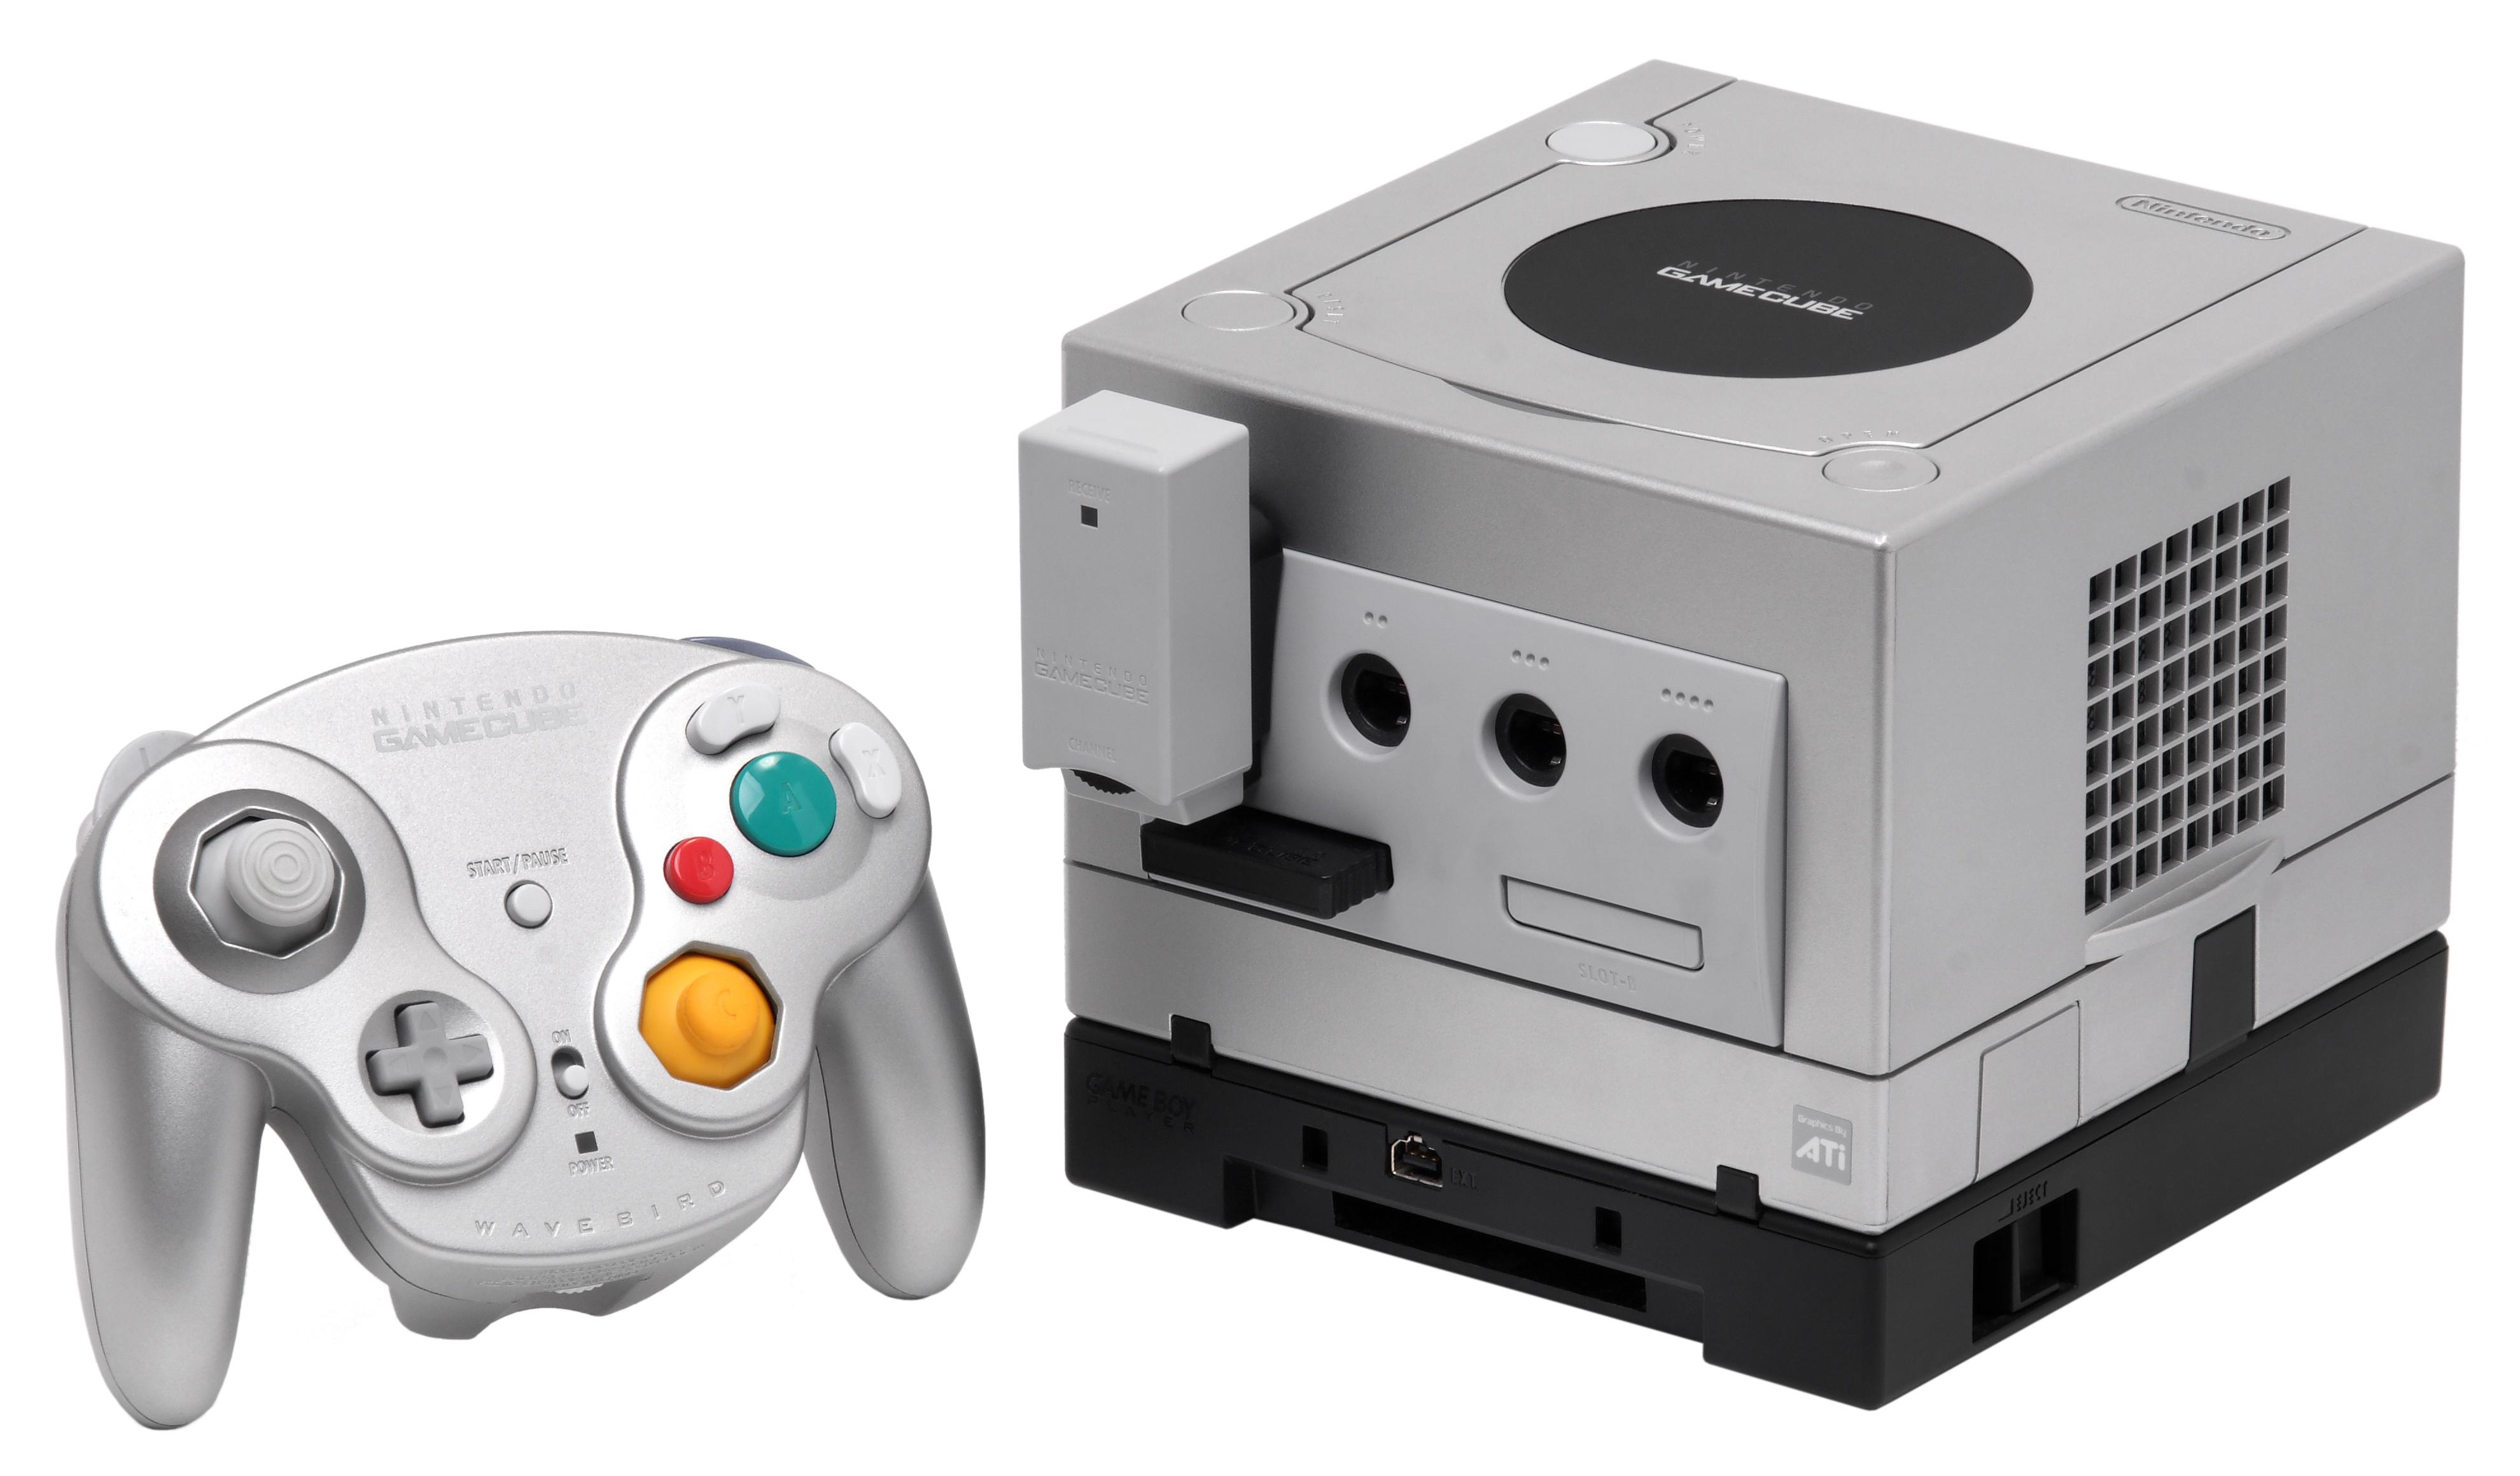 GameCube con GameBoy Player